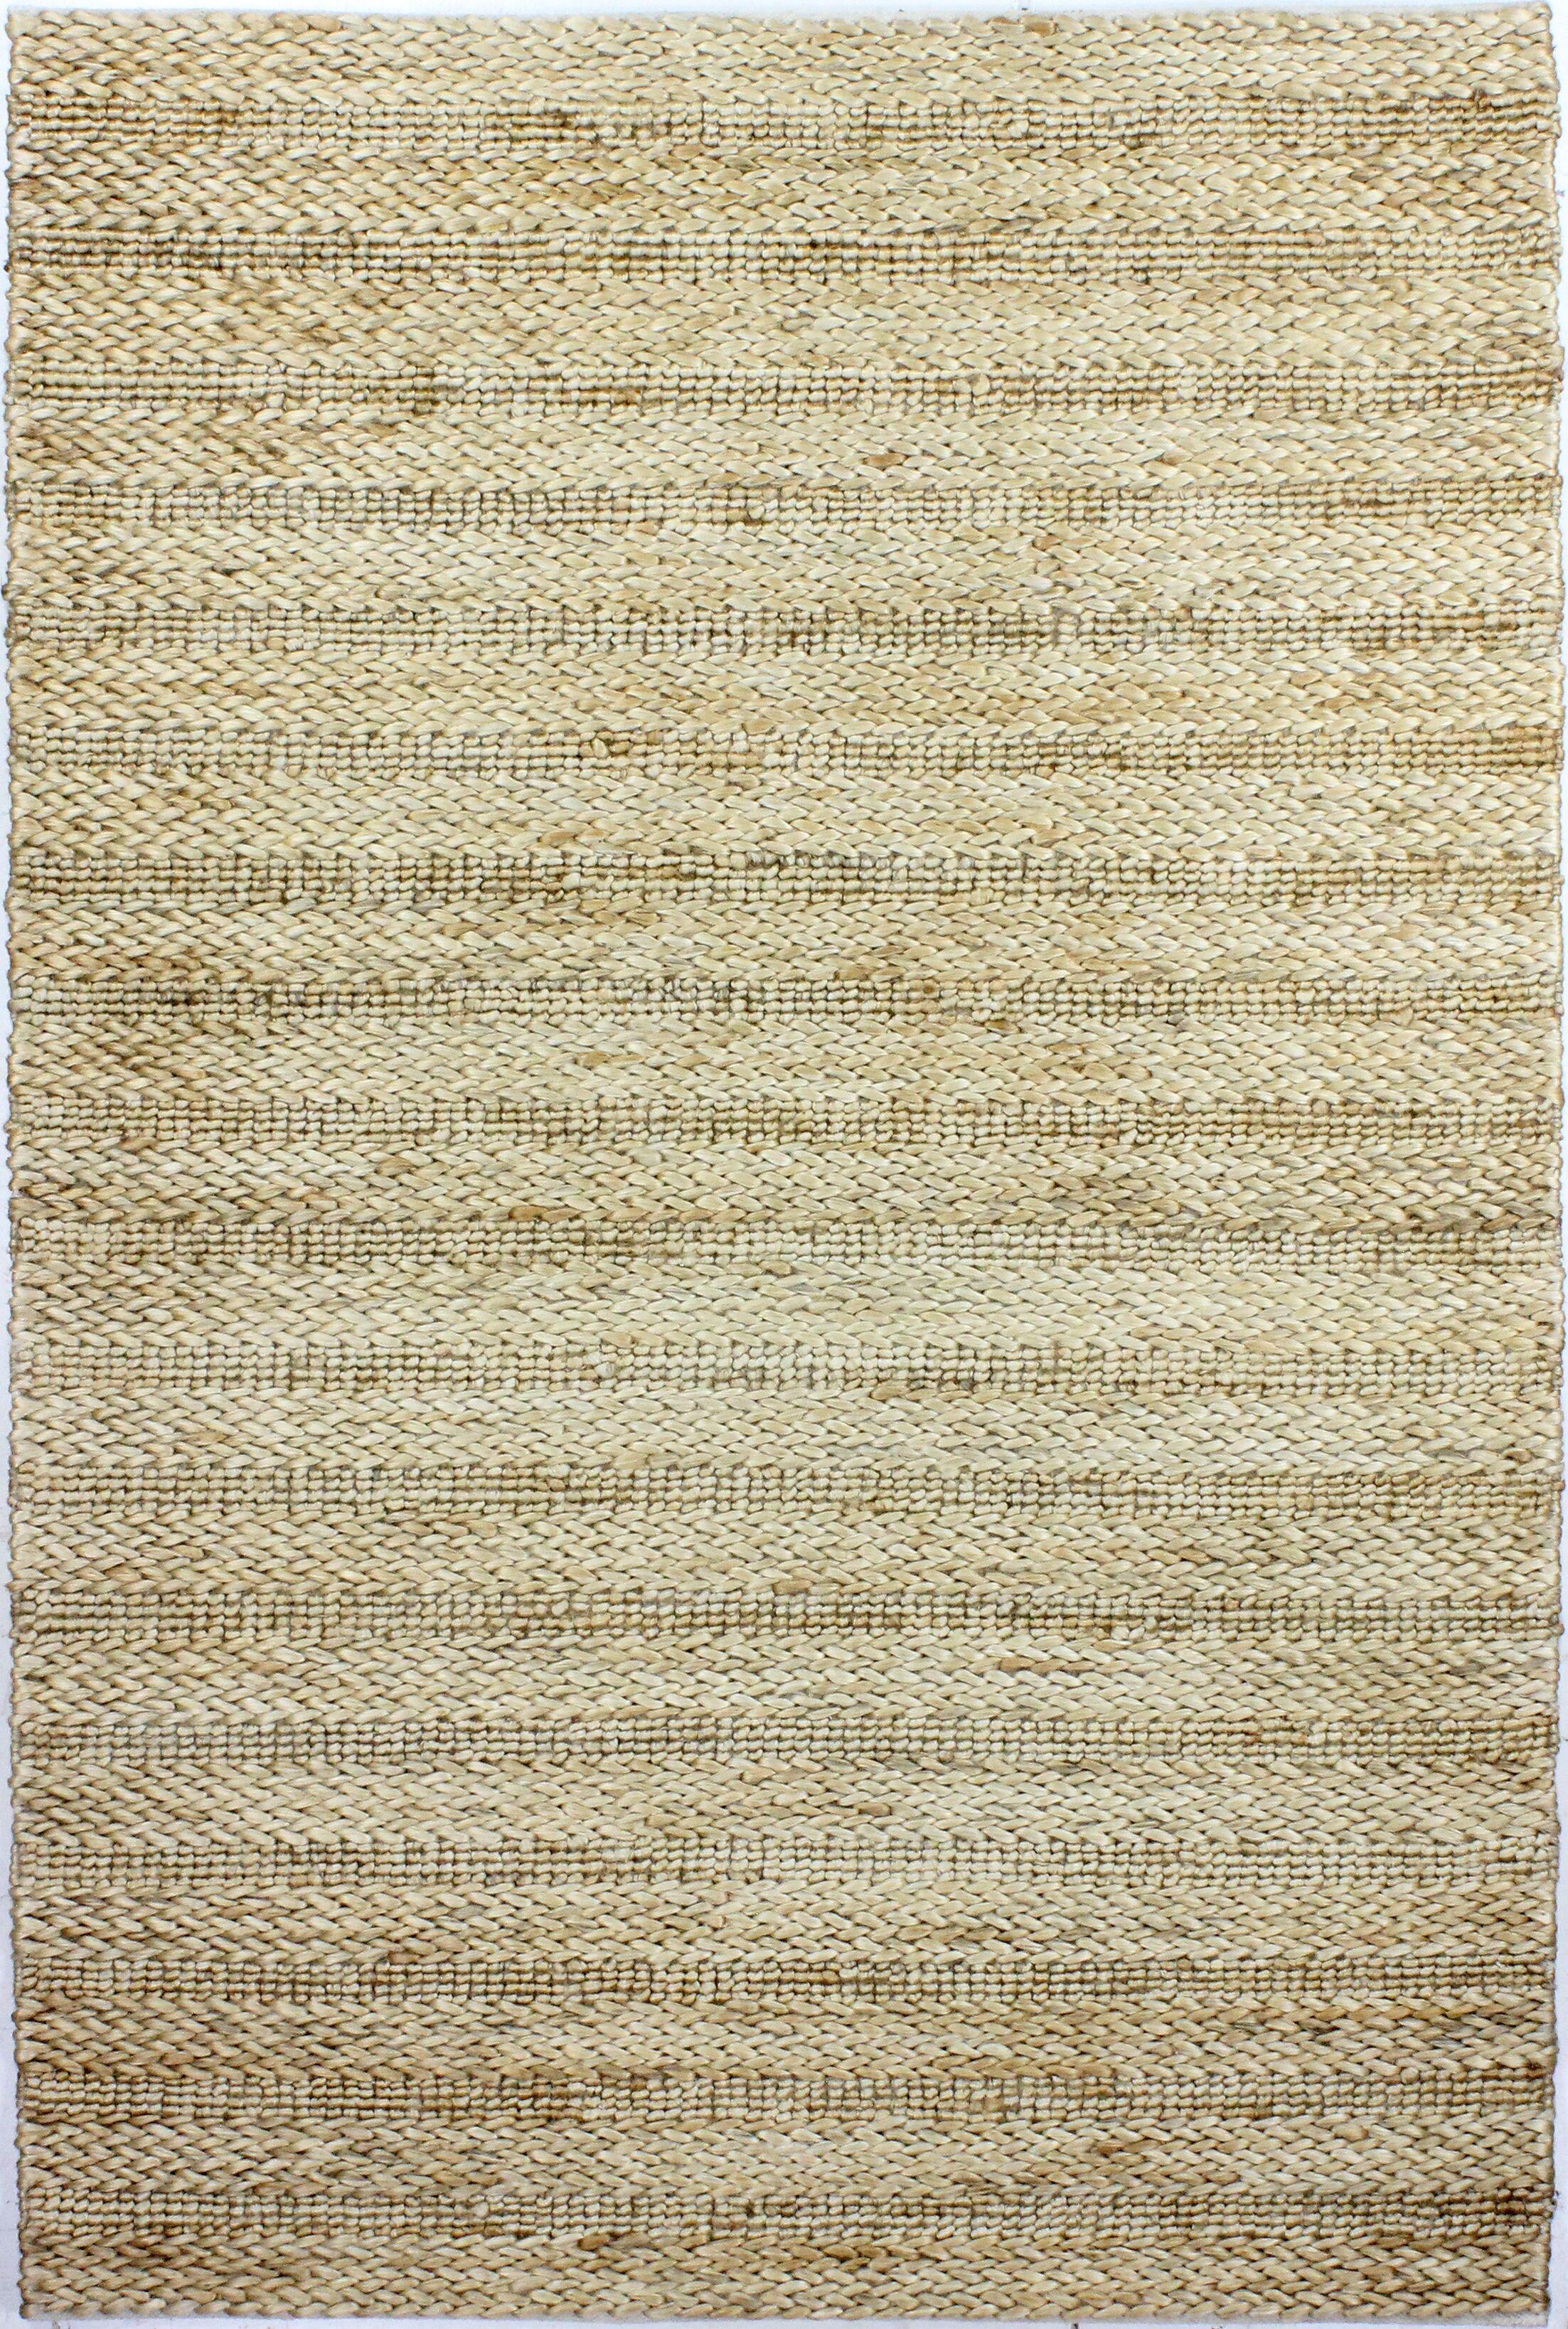 Attleboro Hand-Woven Natural Area Rug Rug Size: 5' x 7'6